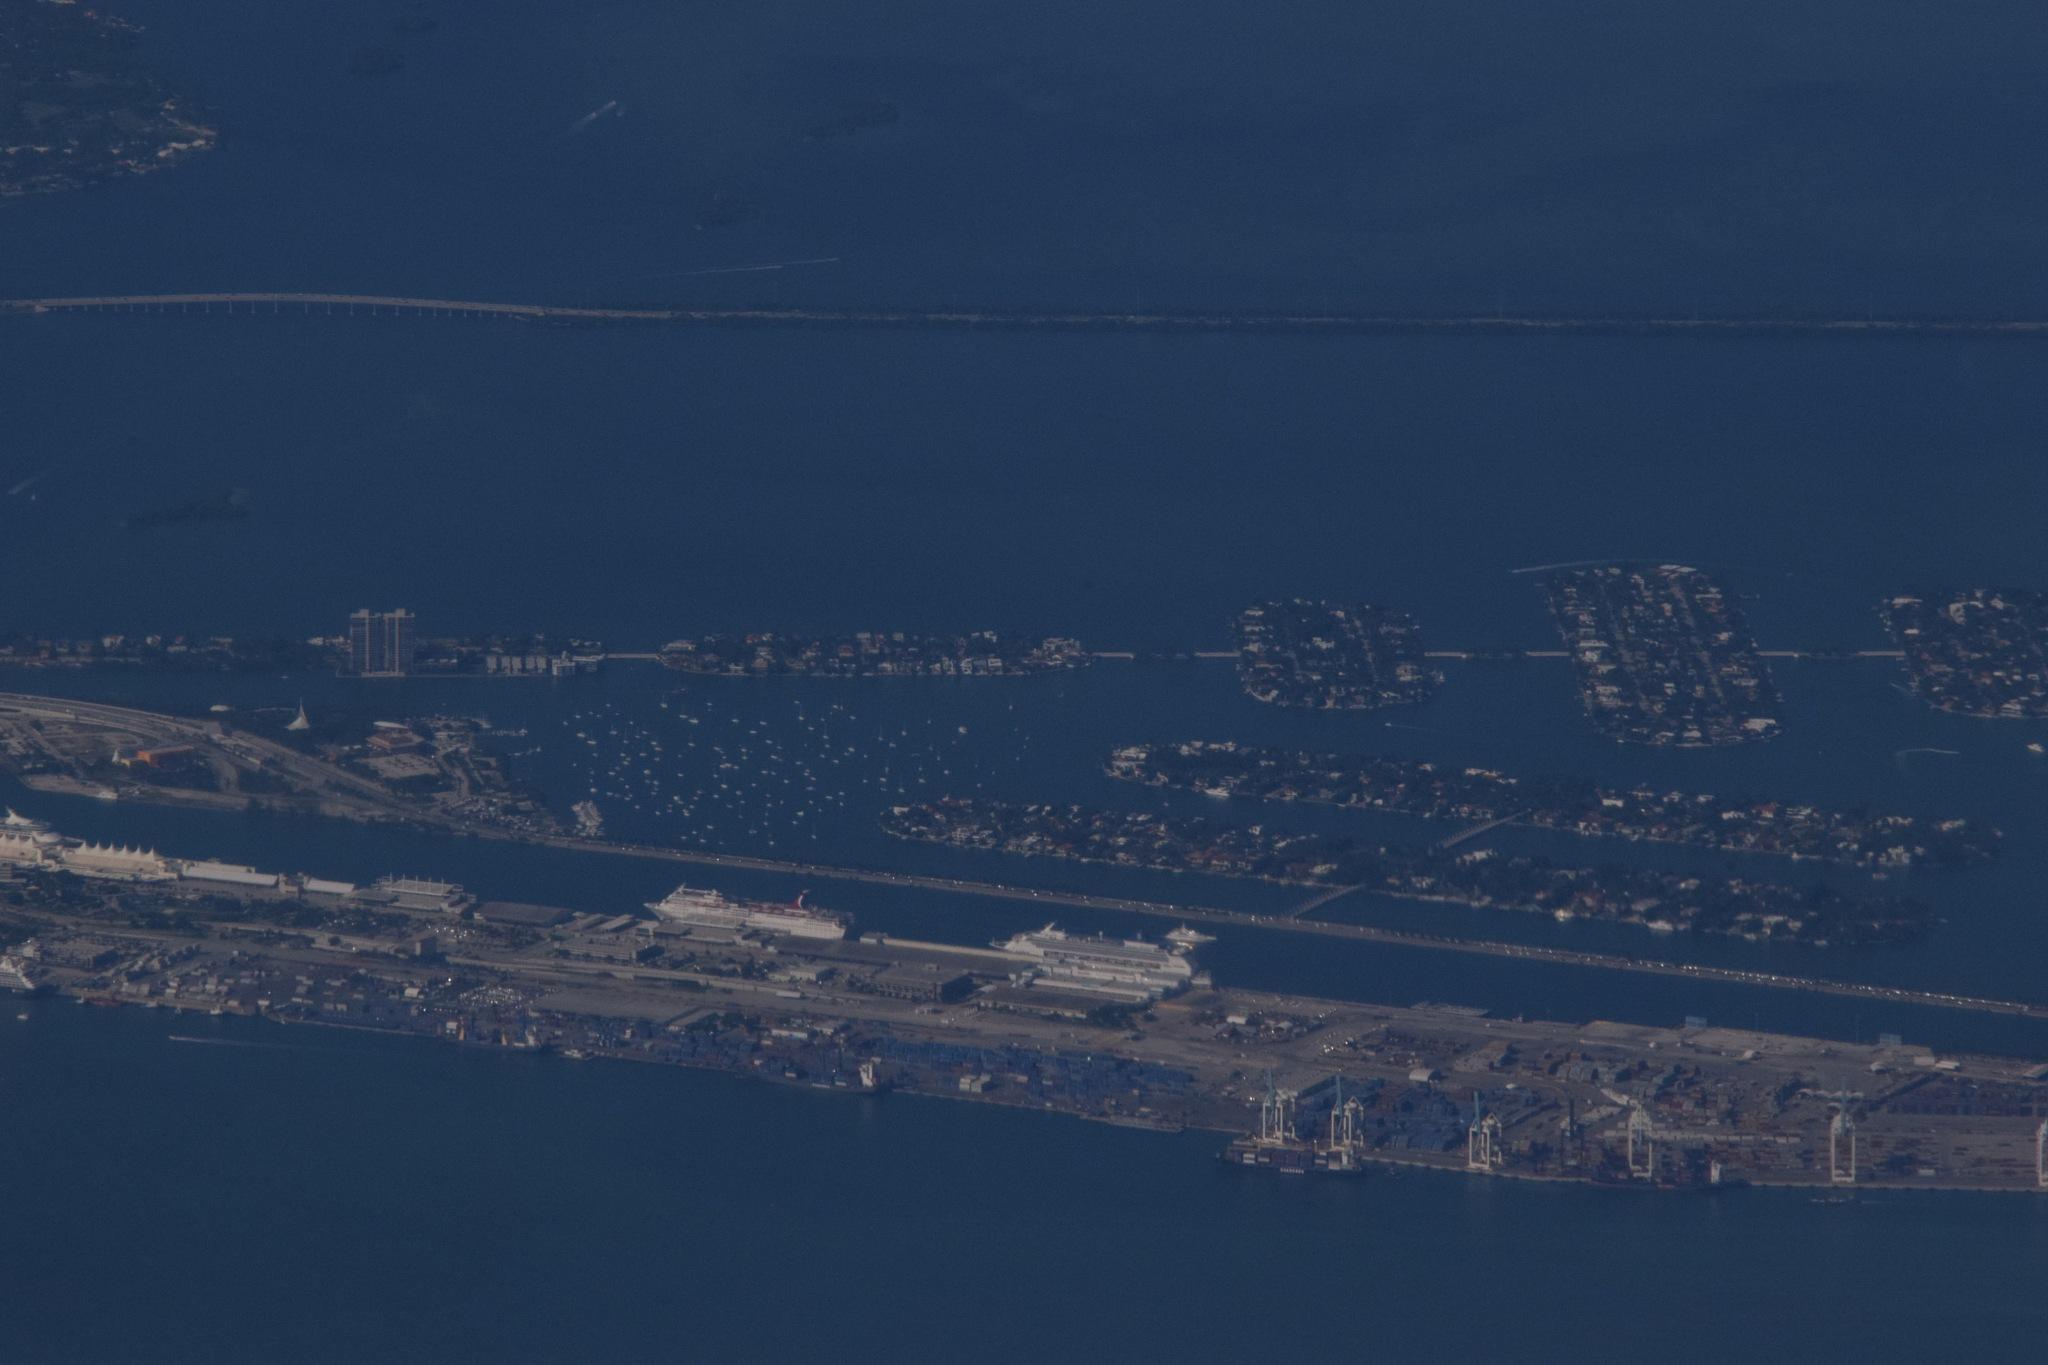 Miami 3 by KMcCord